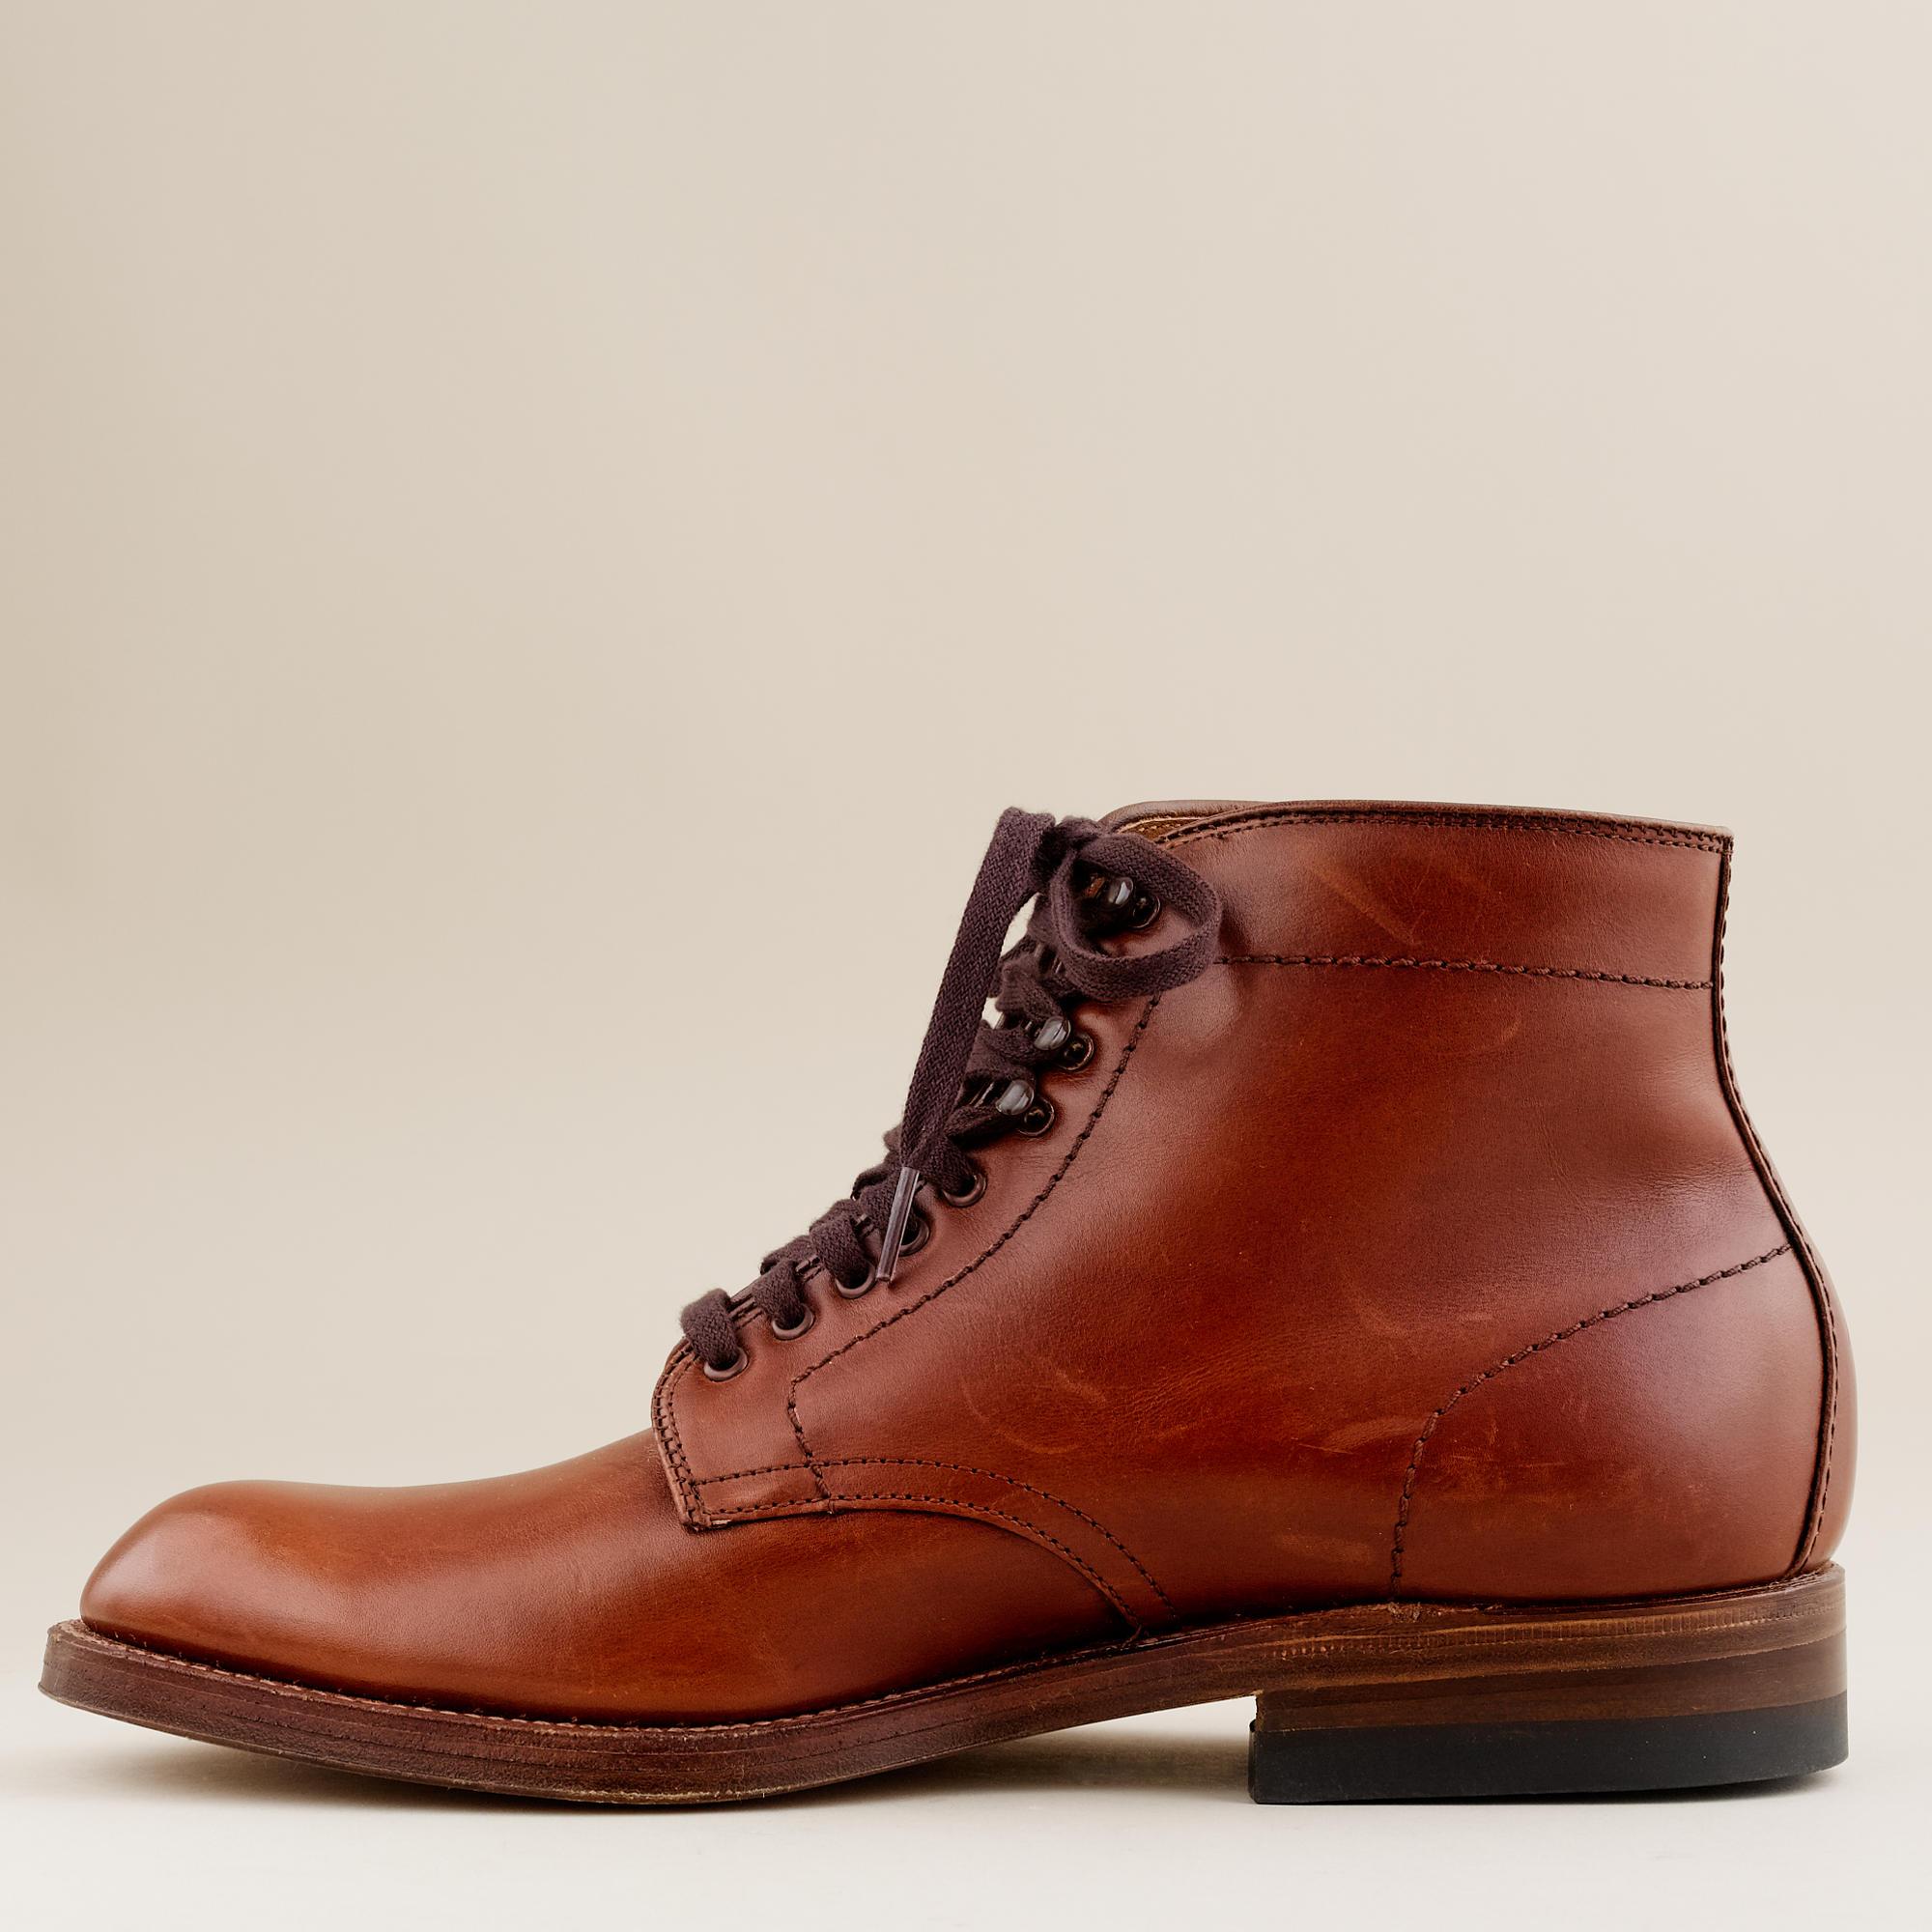 8a6205baa3e Alden Brown Alden® For J.crew Plain-toe Boots for men